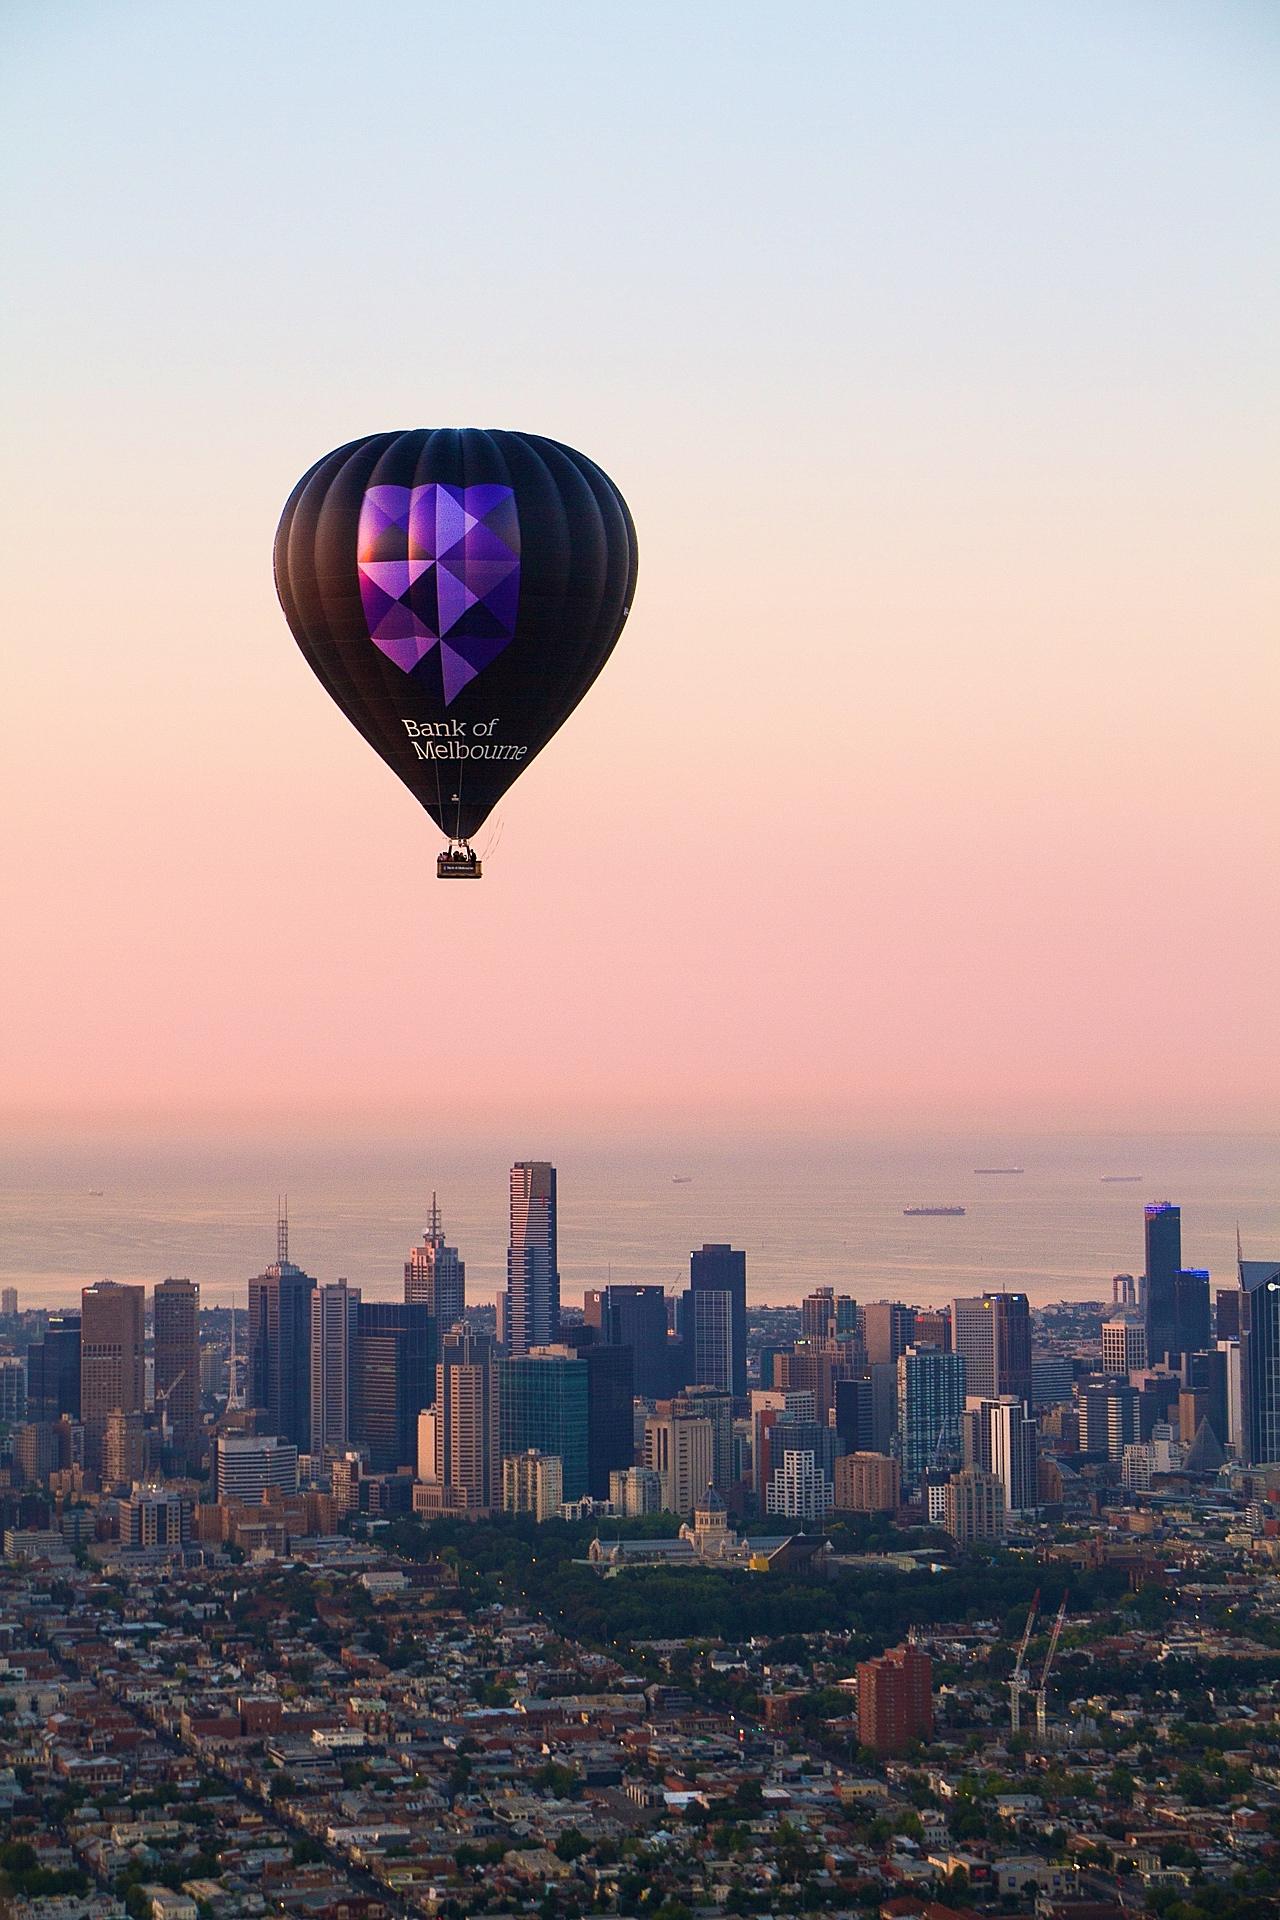 Bank of Melbourne hot air balloon over Melbourne 1.jpeg